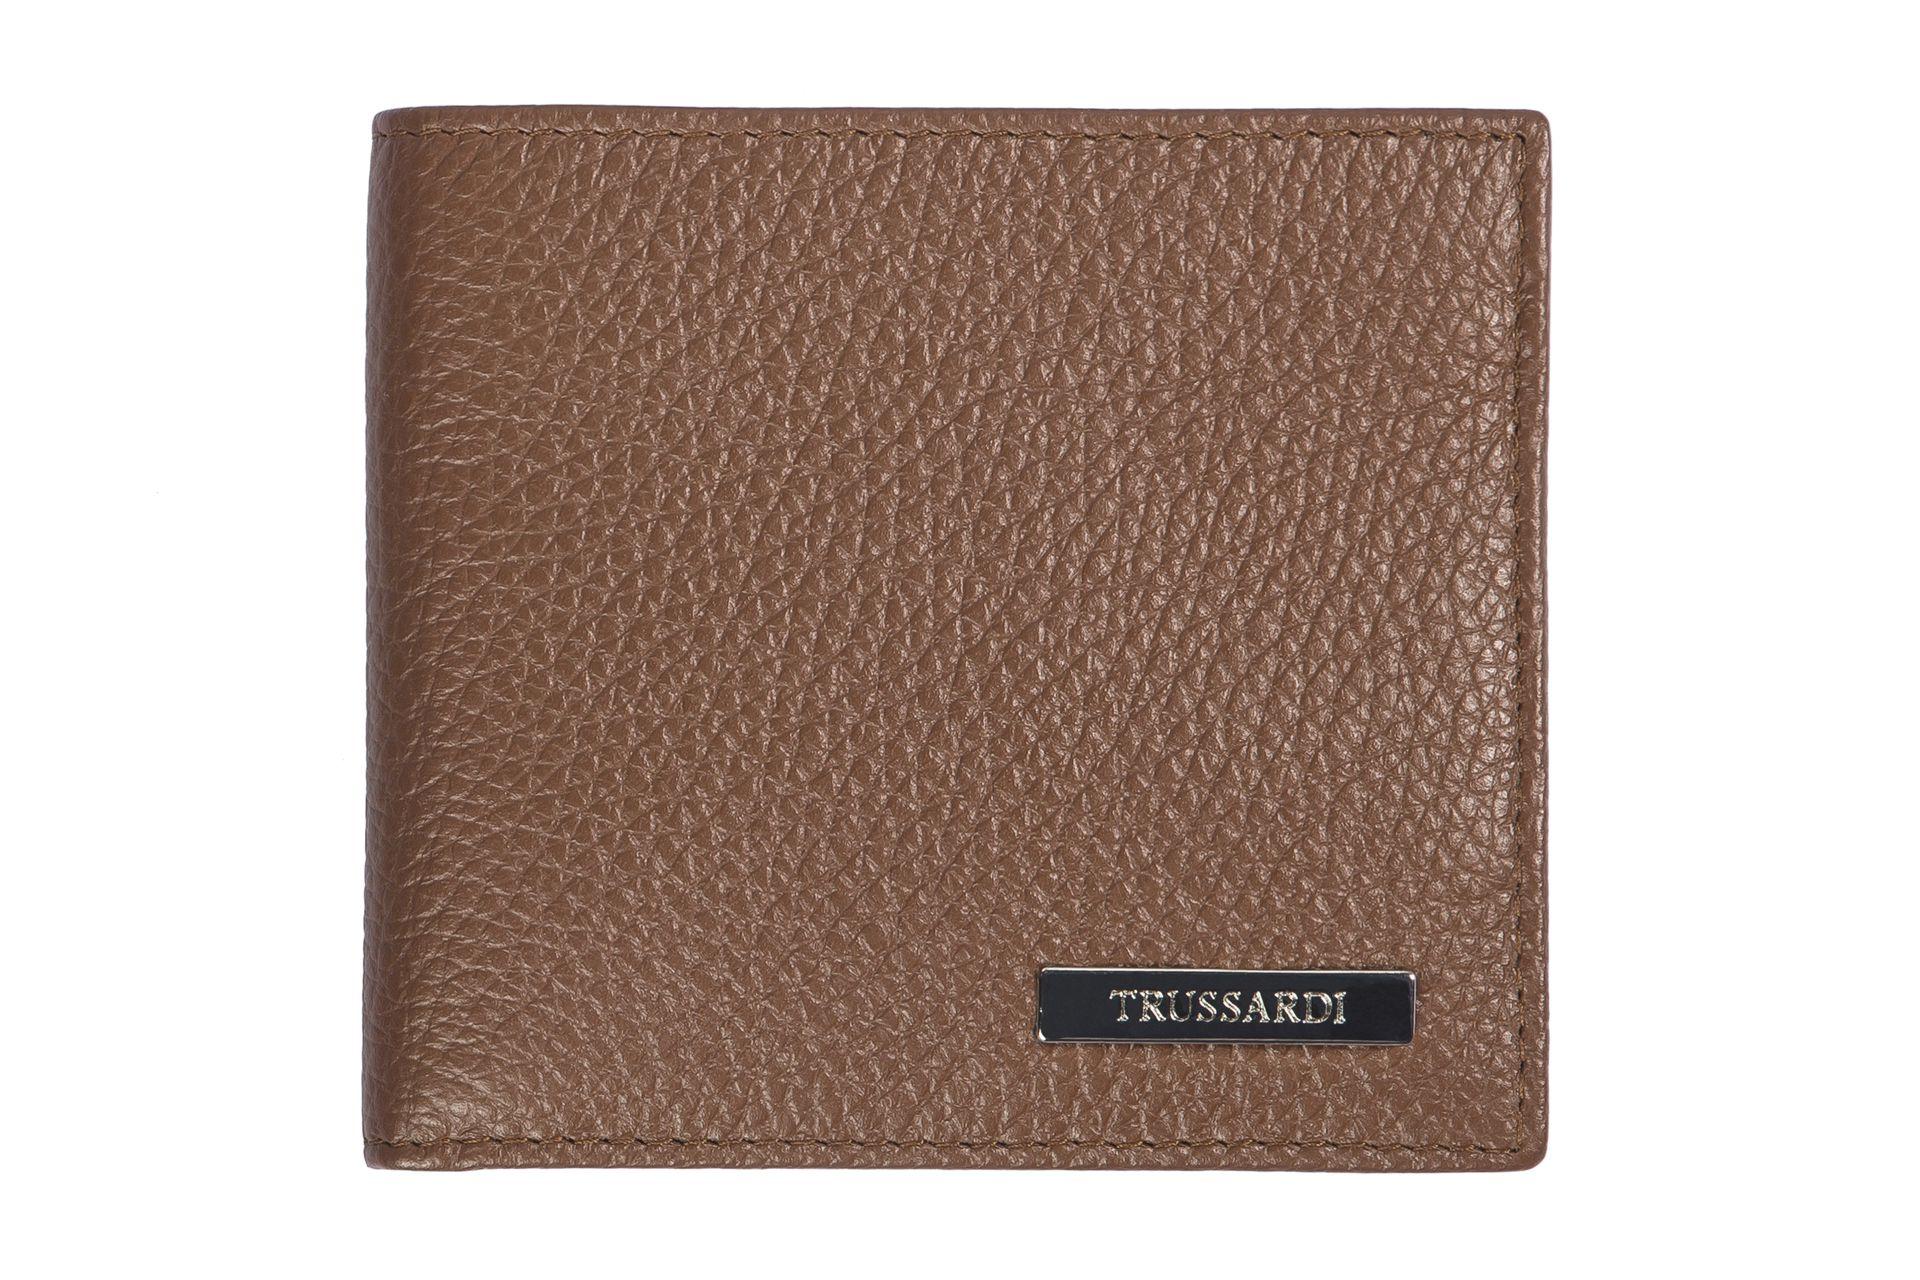 Trussardi Men's Wallet Beige 72P026_69DarkBrown